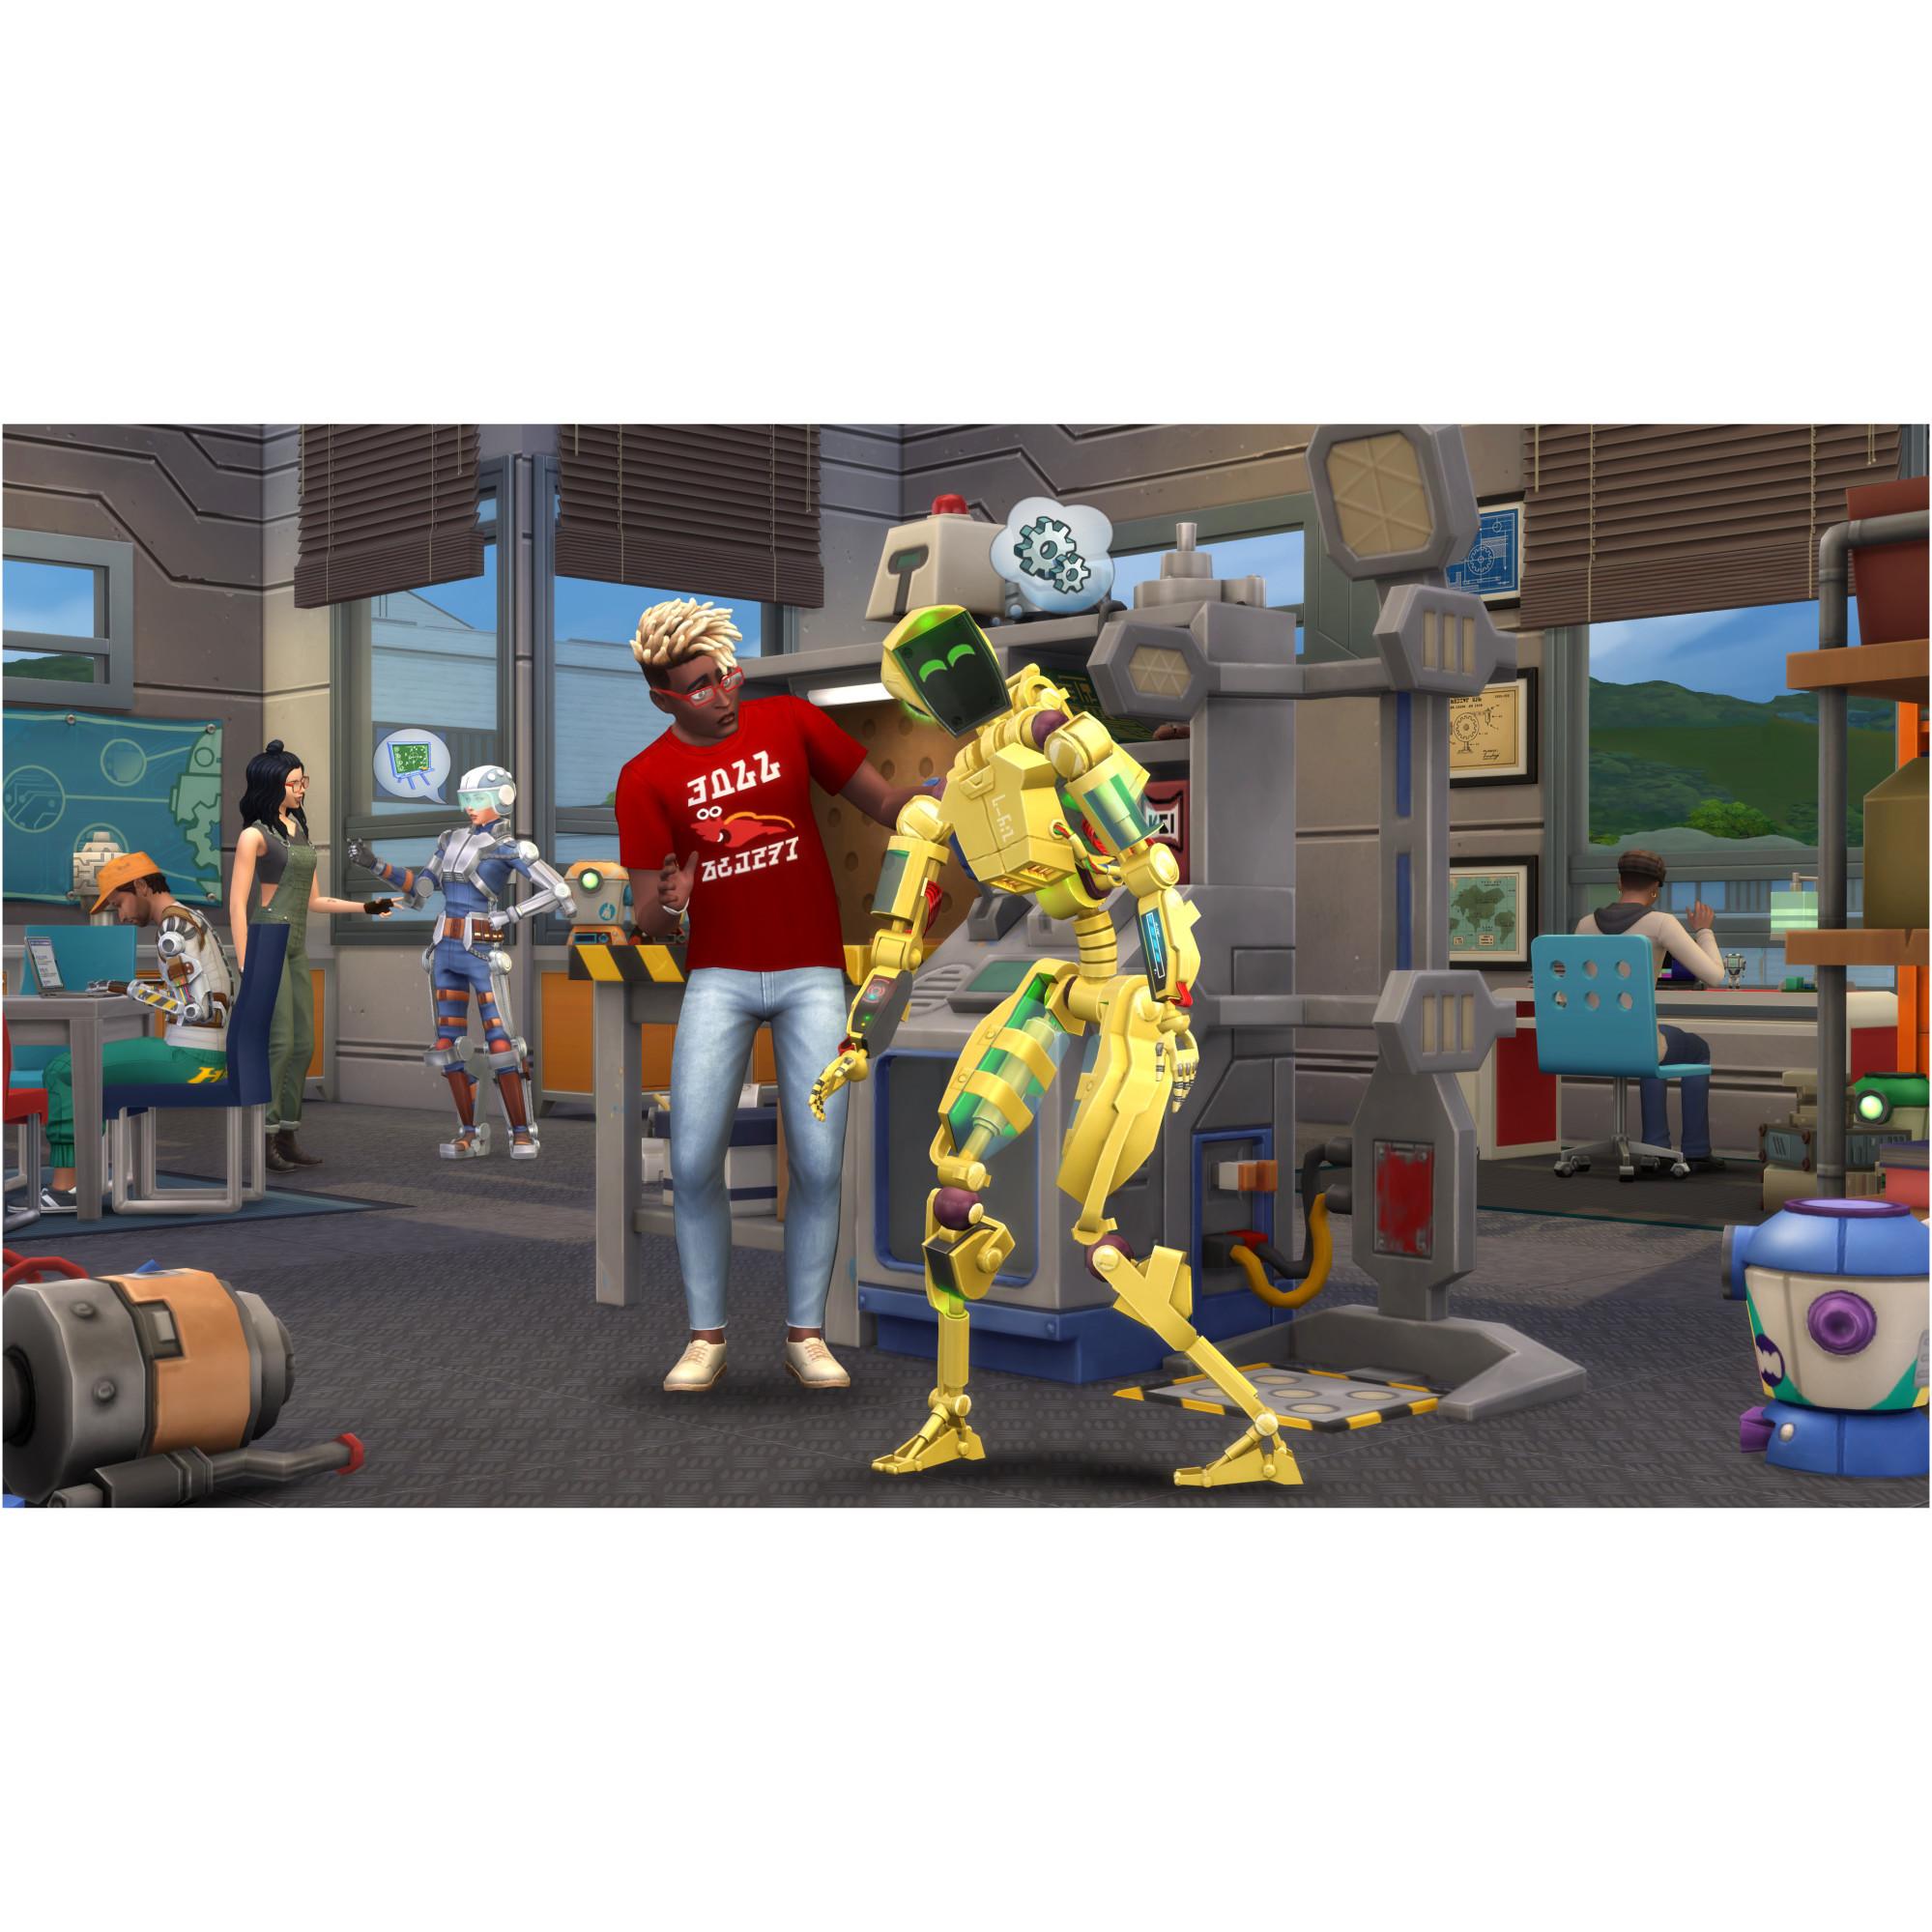 Expansiune The Sims 4 EP8 Discover University pentru PC 2